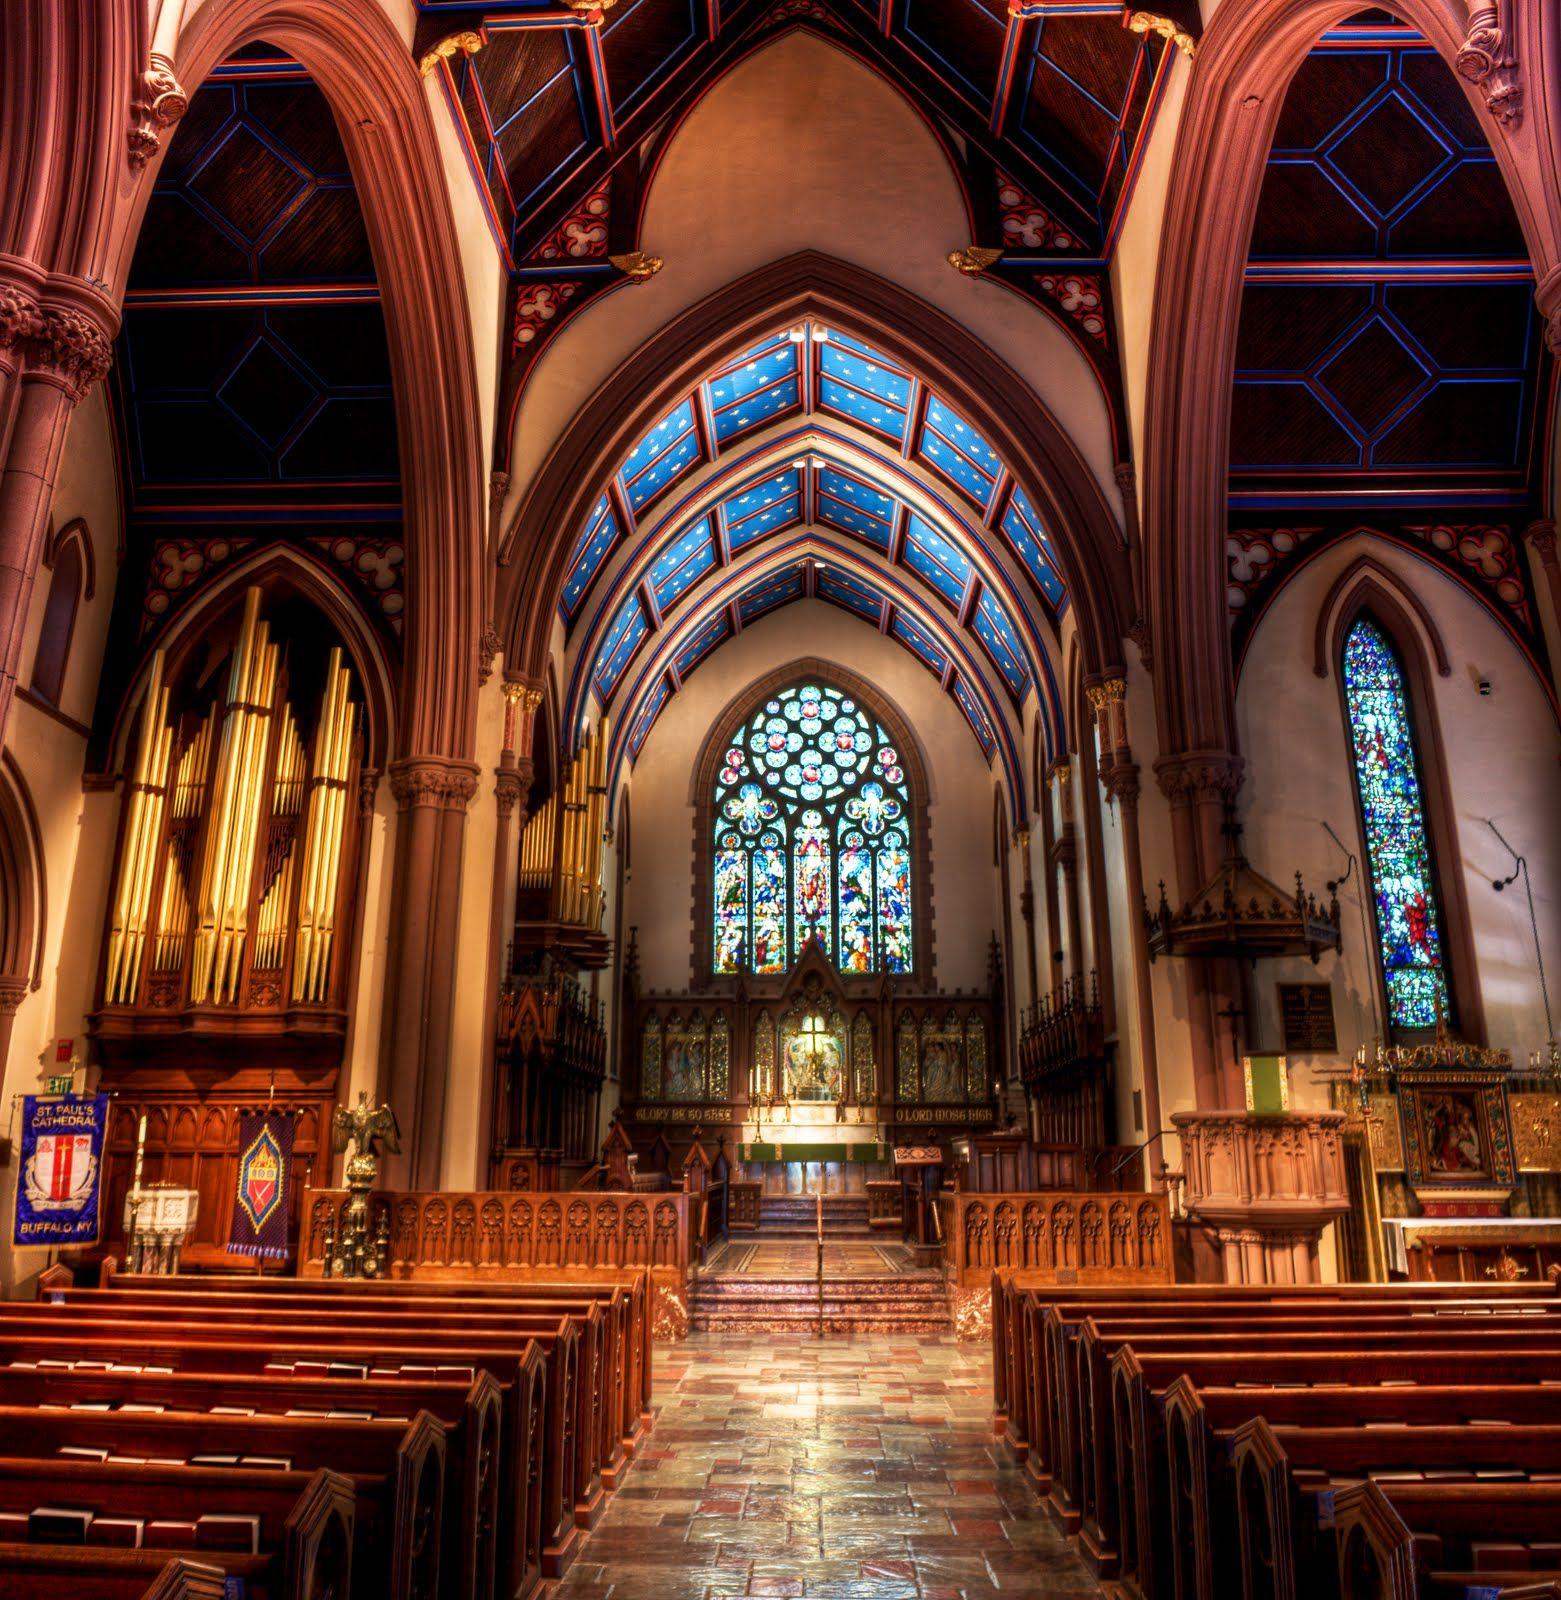 St. Paul's Cathedral - Hope Jones, Schlicker